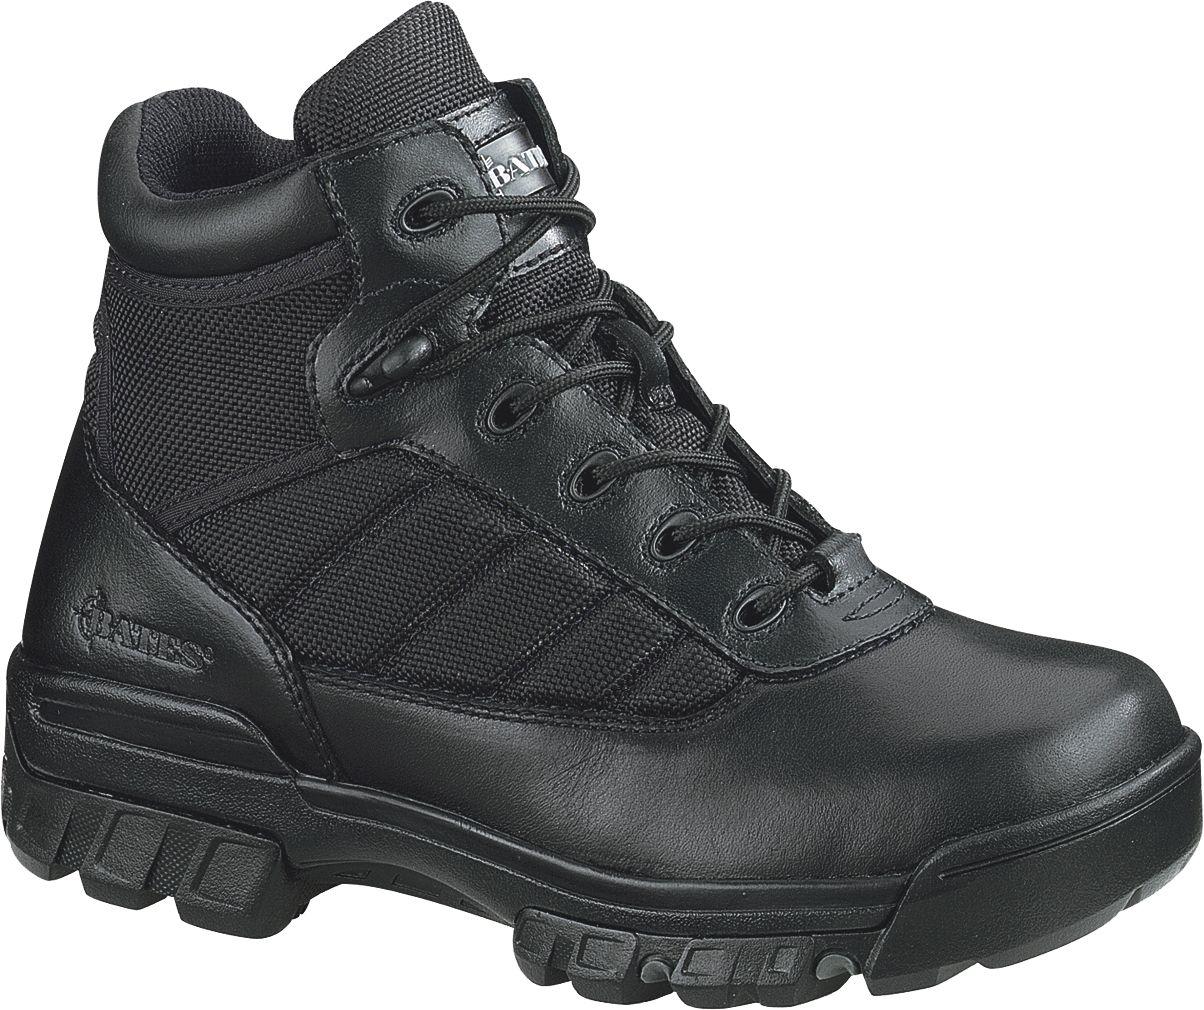 "Bates Women's Tactical 5"" Sport Water-Resistant Boots, Black thumbnail"